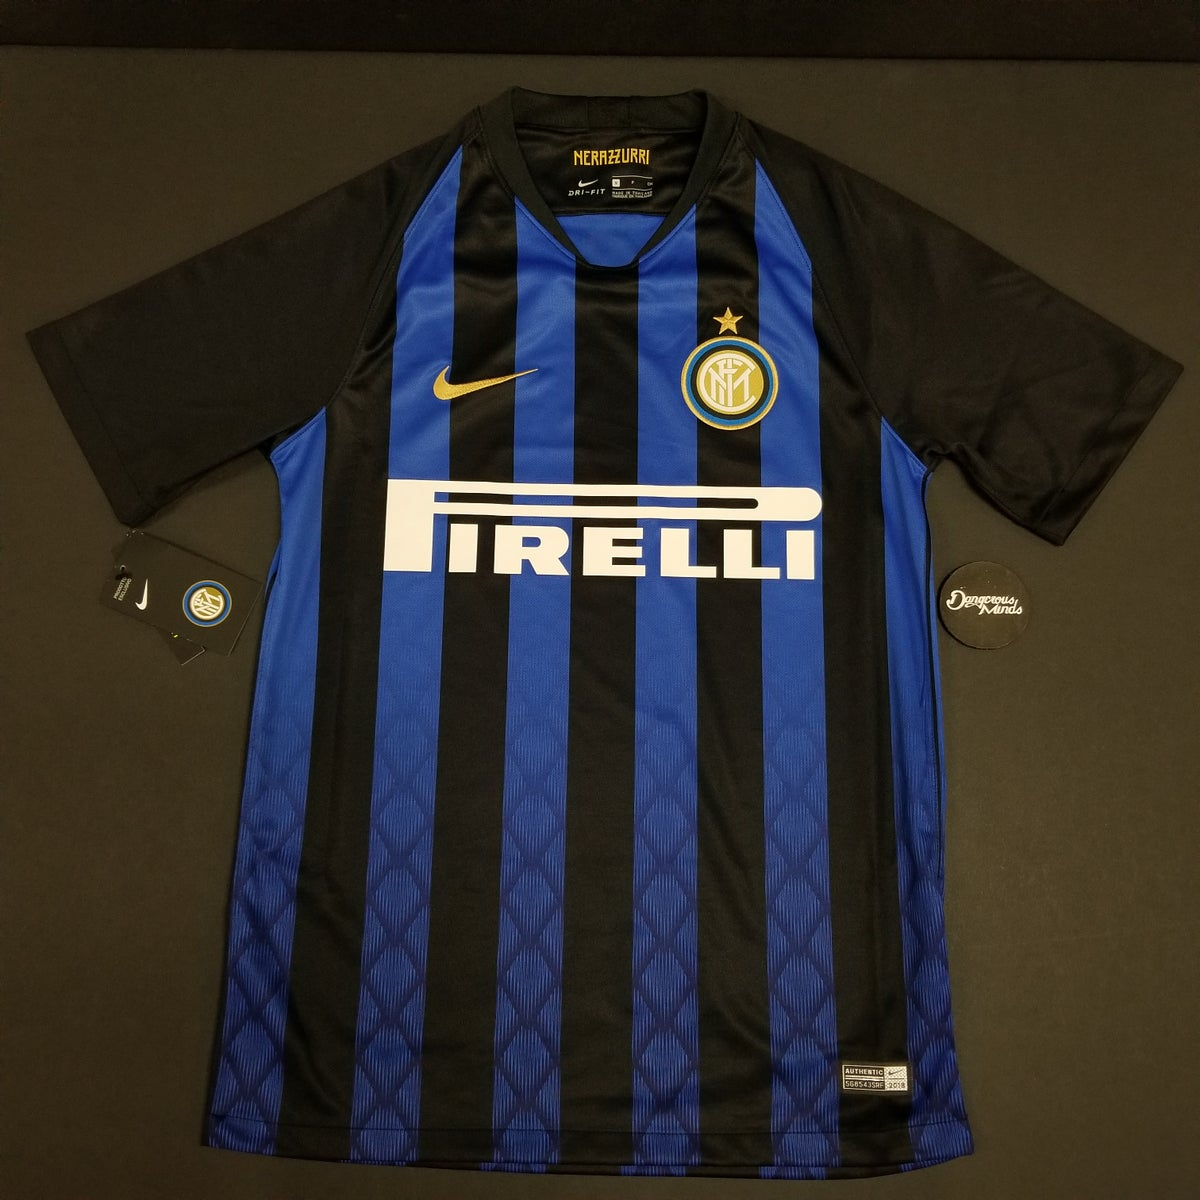 reputable site d5109 69612 Nike 2018-2019 Inter Milan Home Jersey